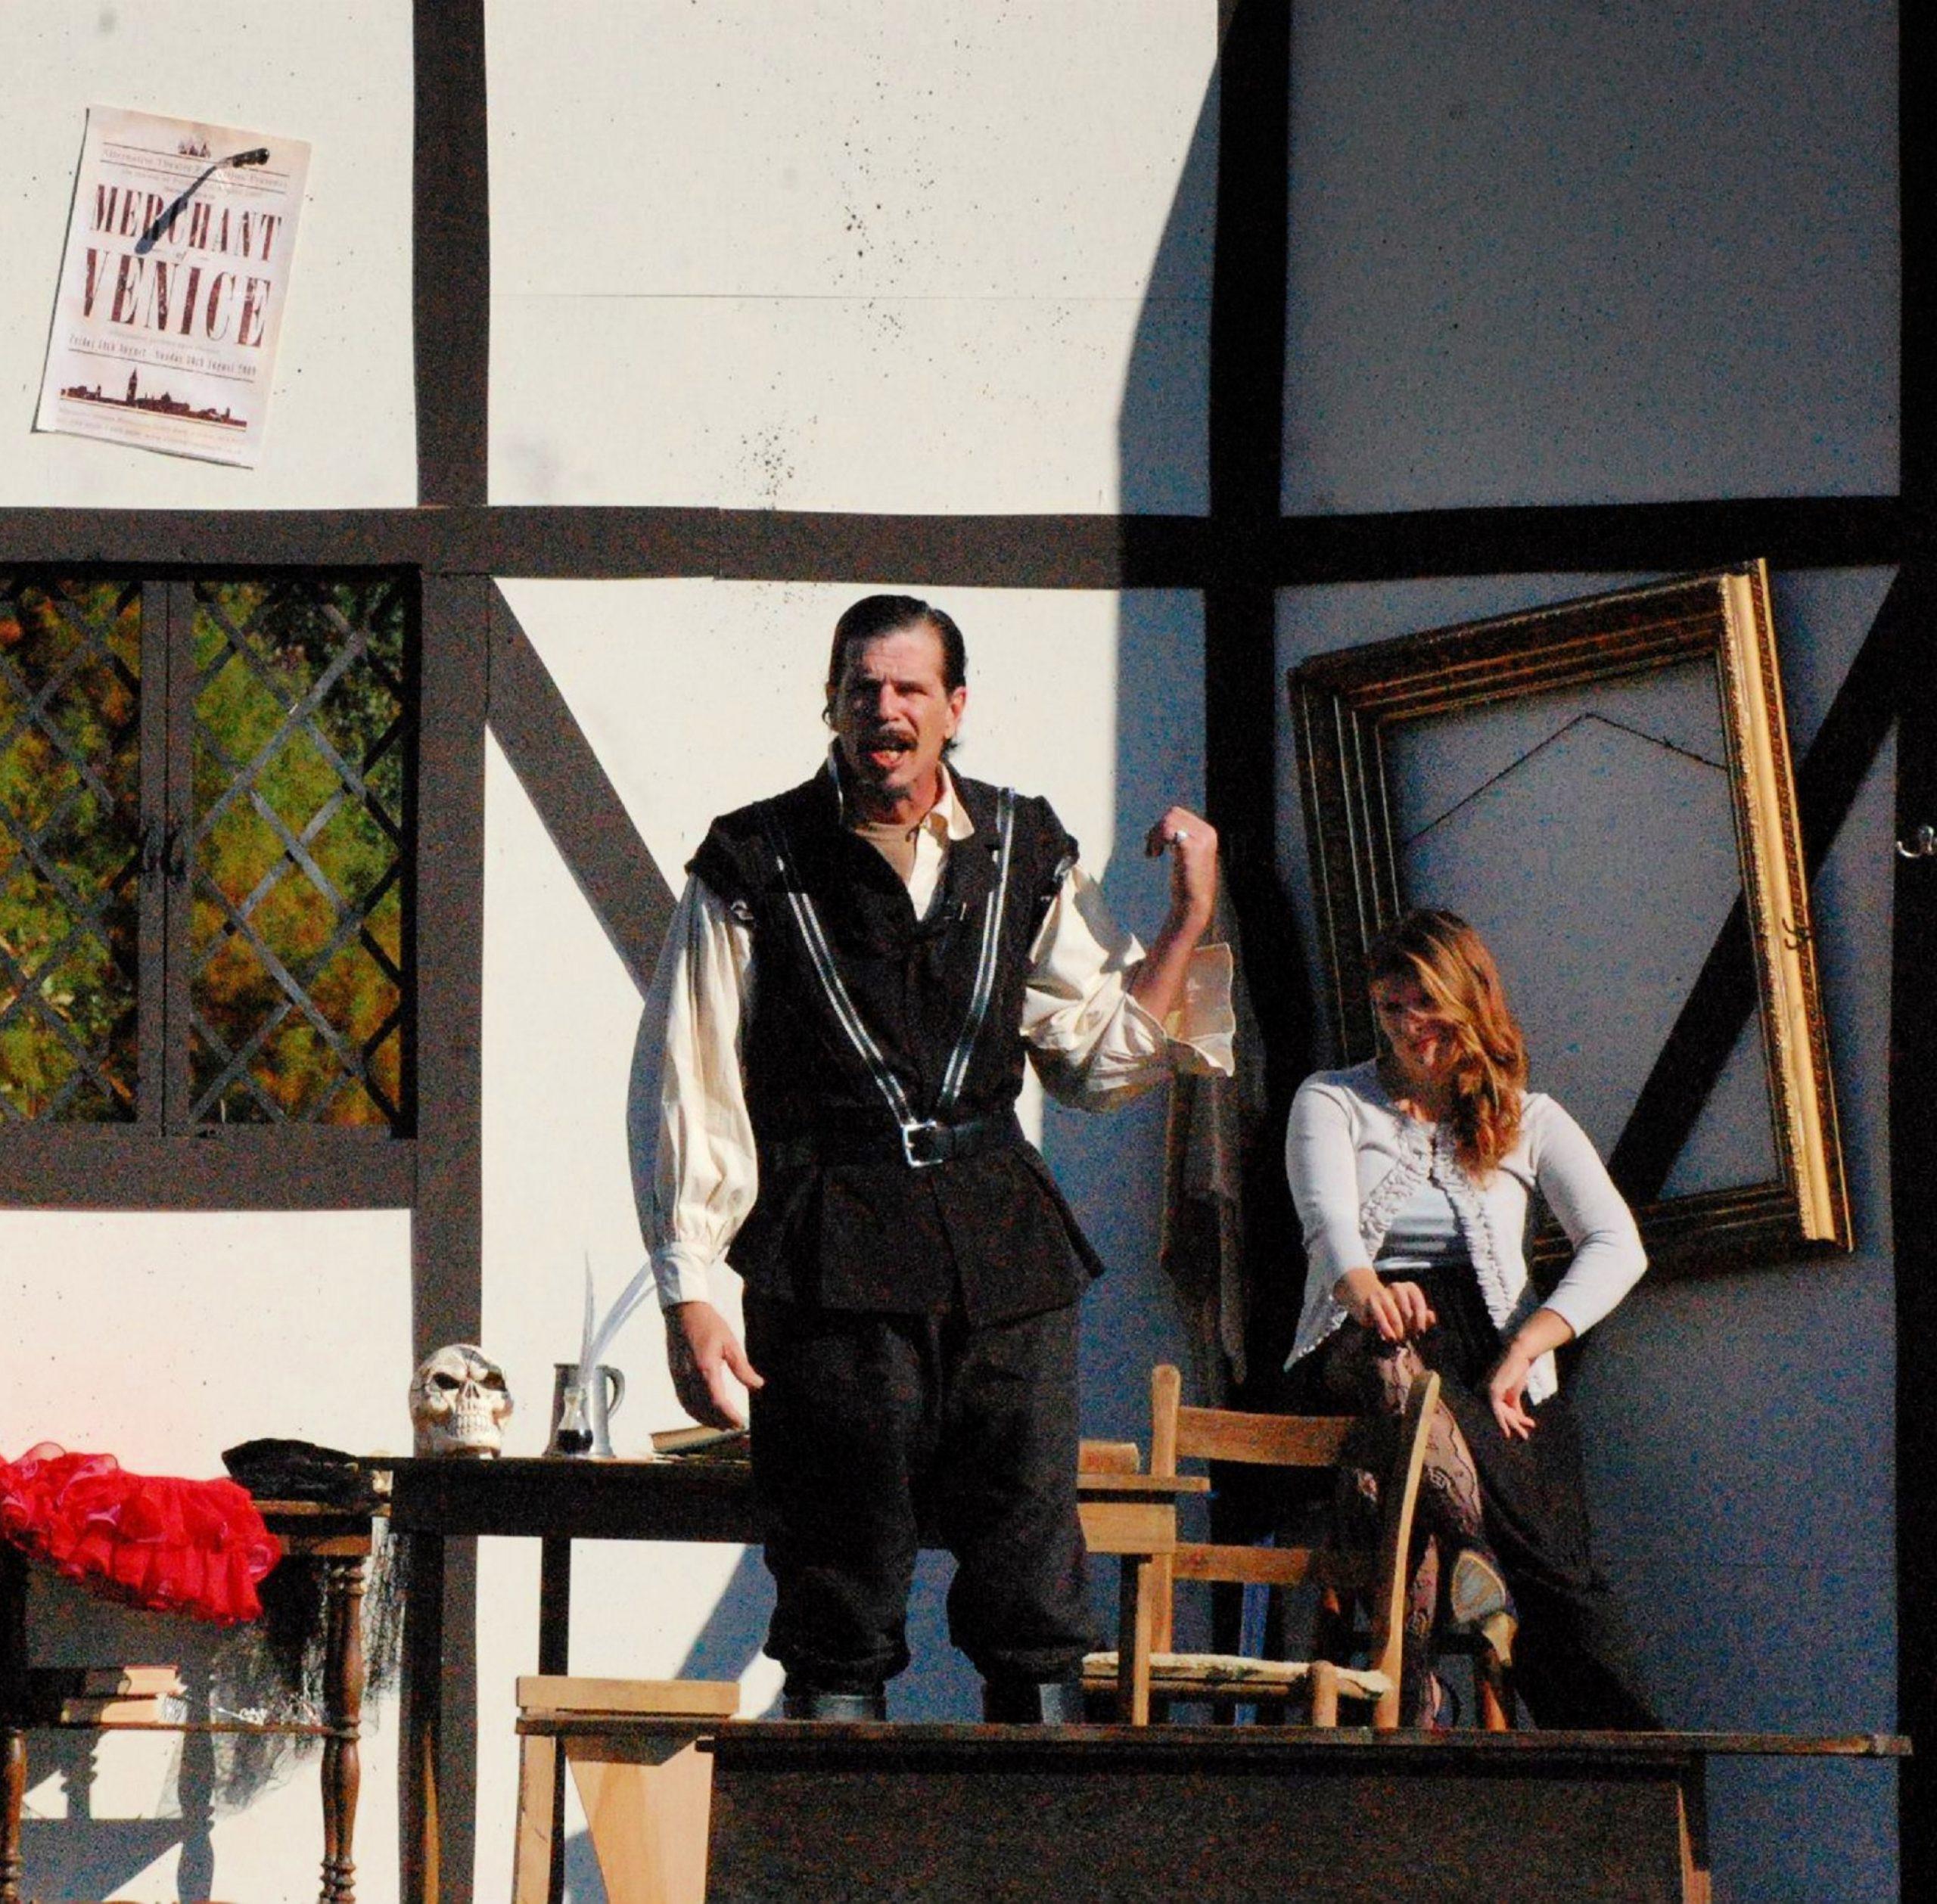 Shore Shakespeare to BringA Little Touch of Shakespeareto Adkins Arboretum